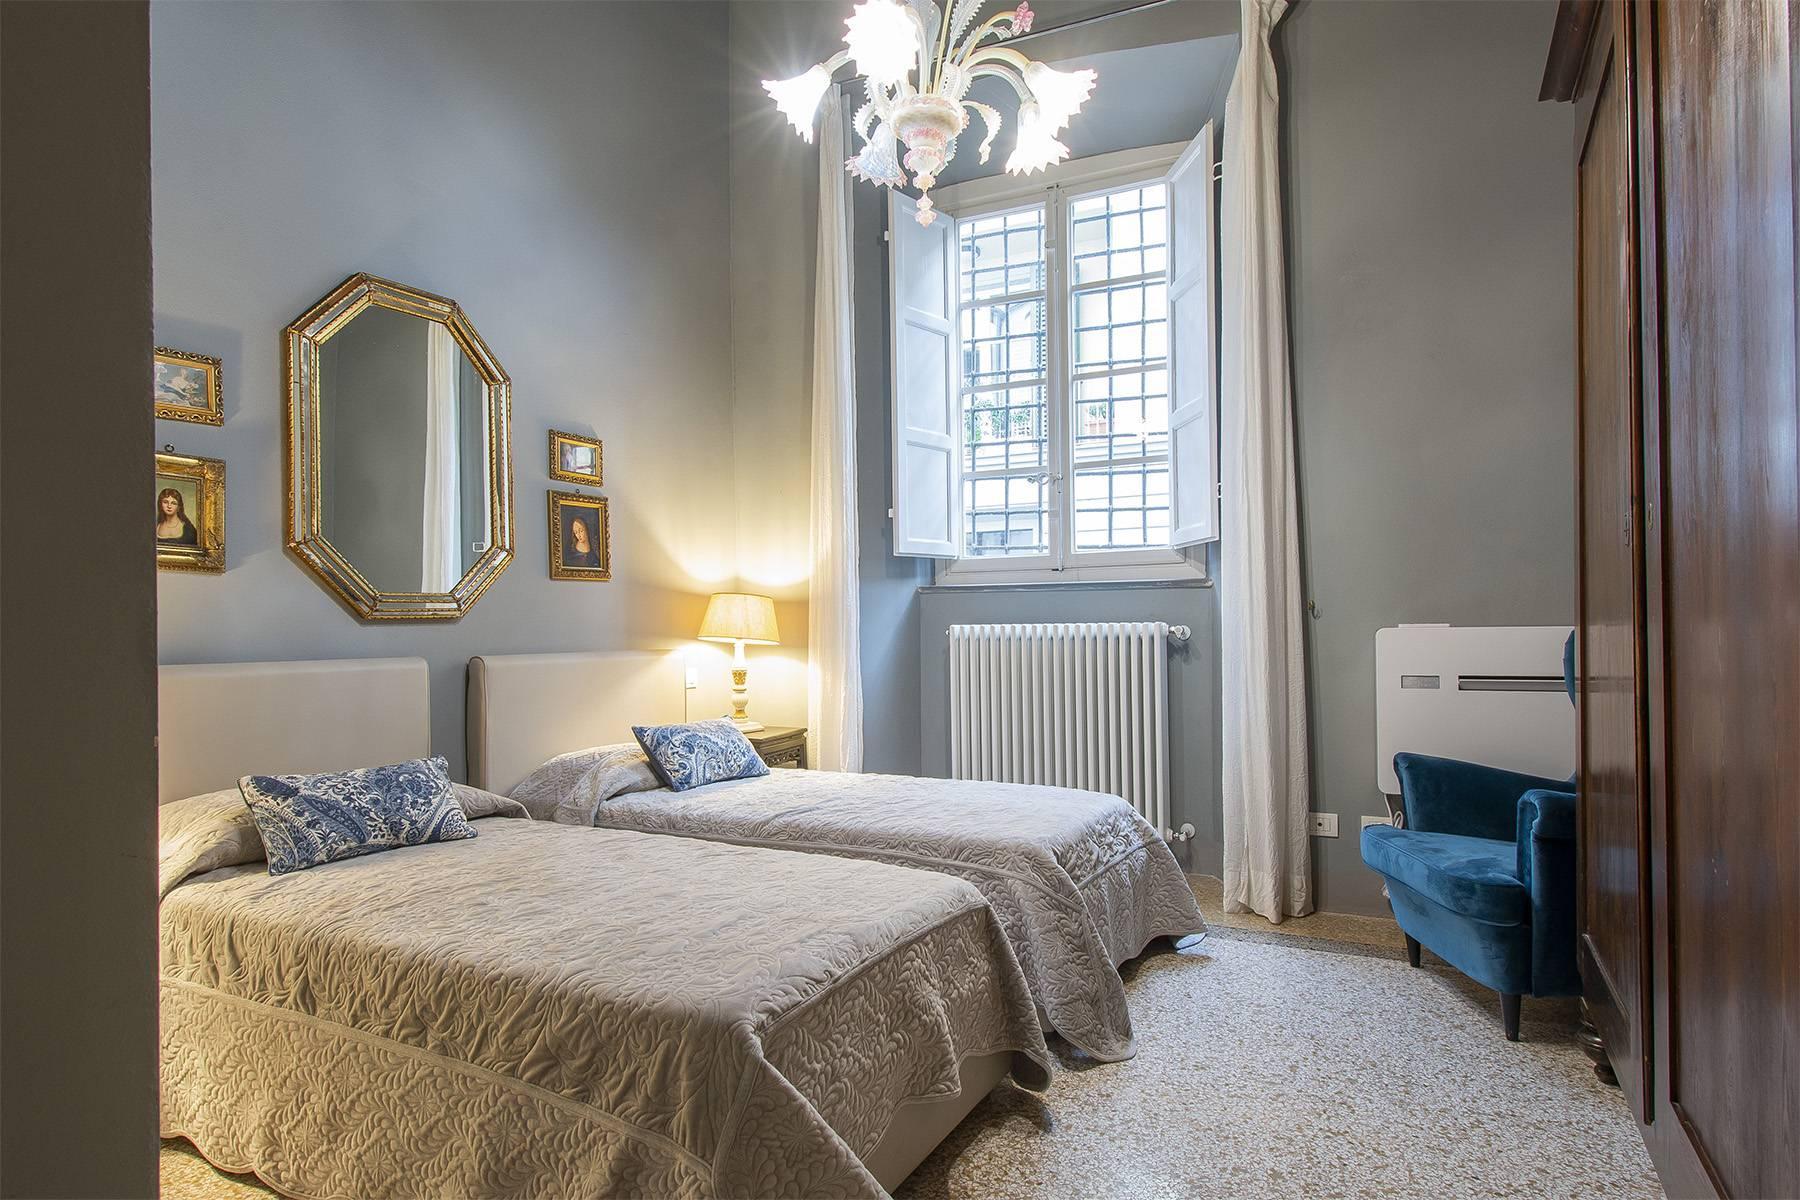 Appartement exclusif au coeur de Lucca - 12